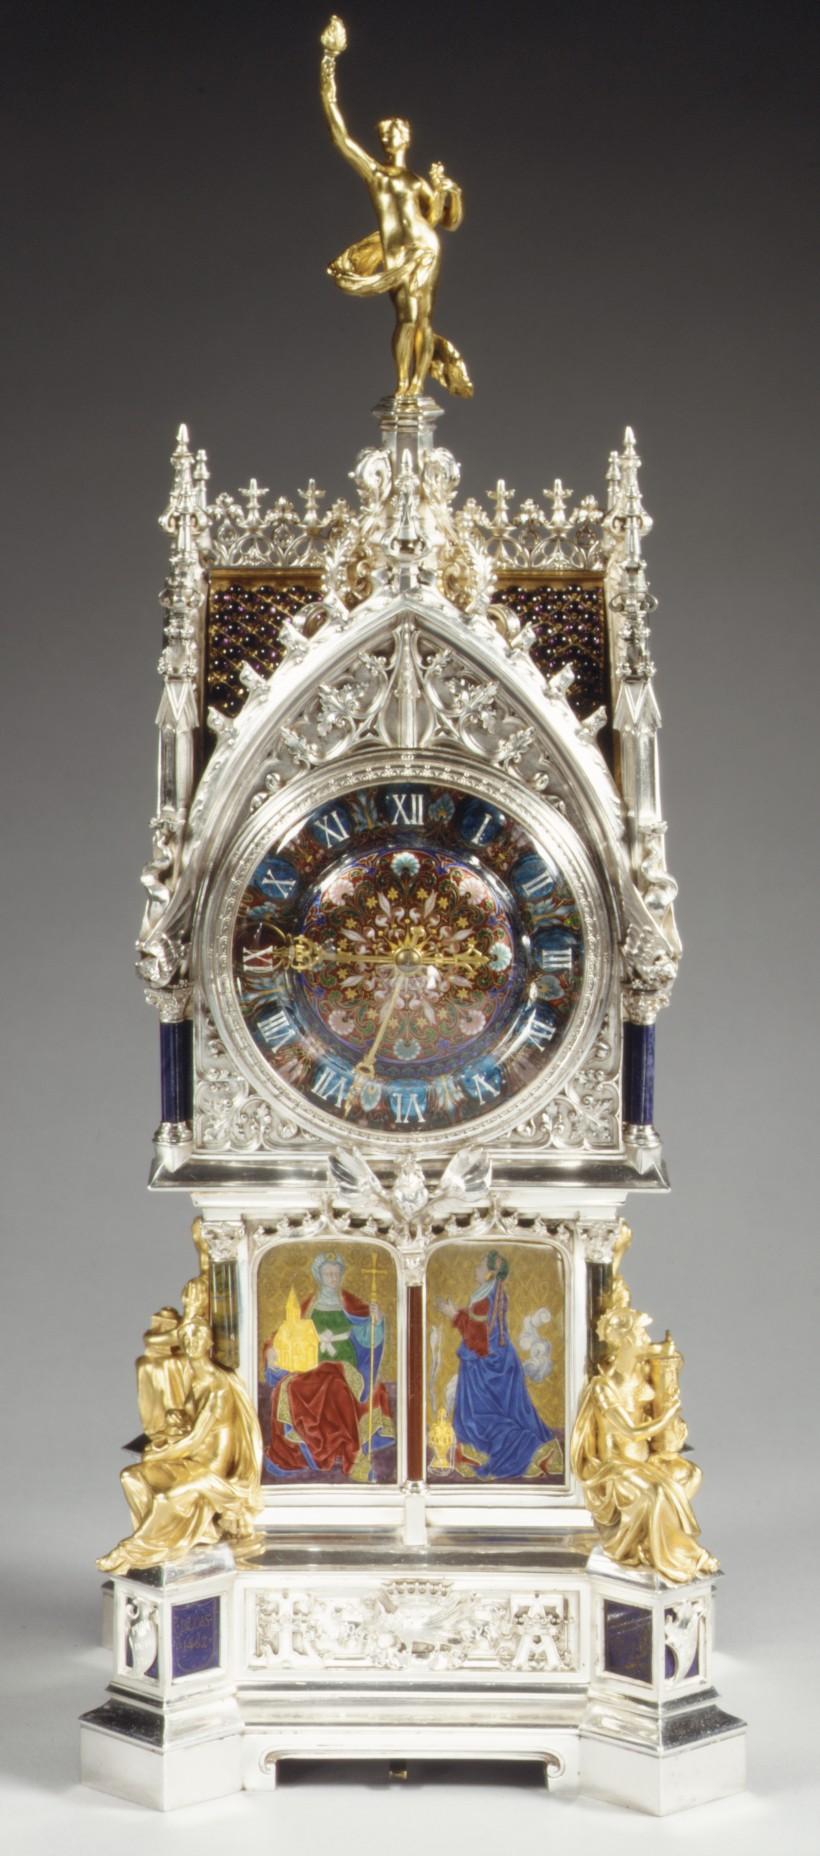 Mantel Clocks Mantels And Porcelain On Pinterest